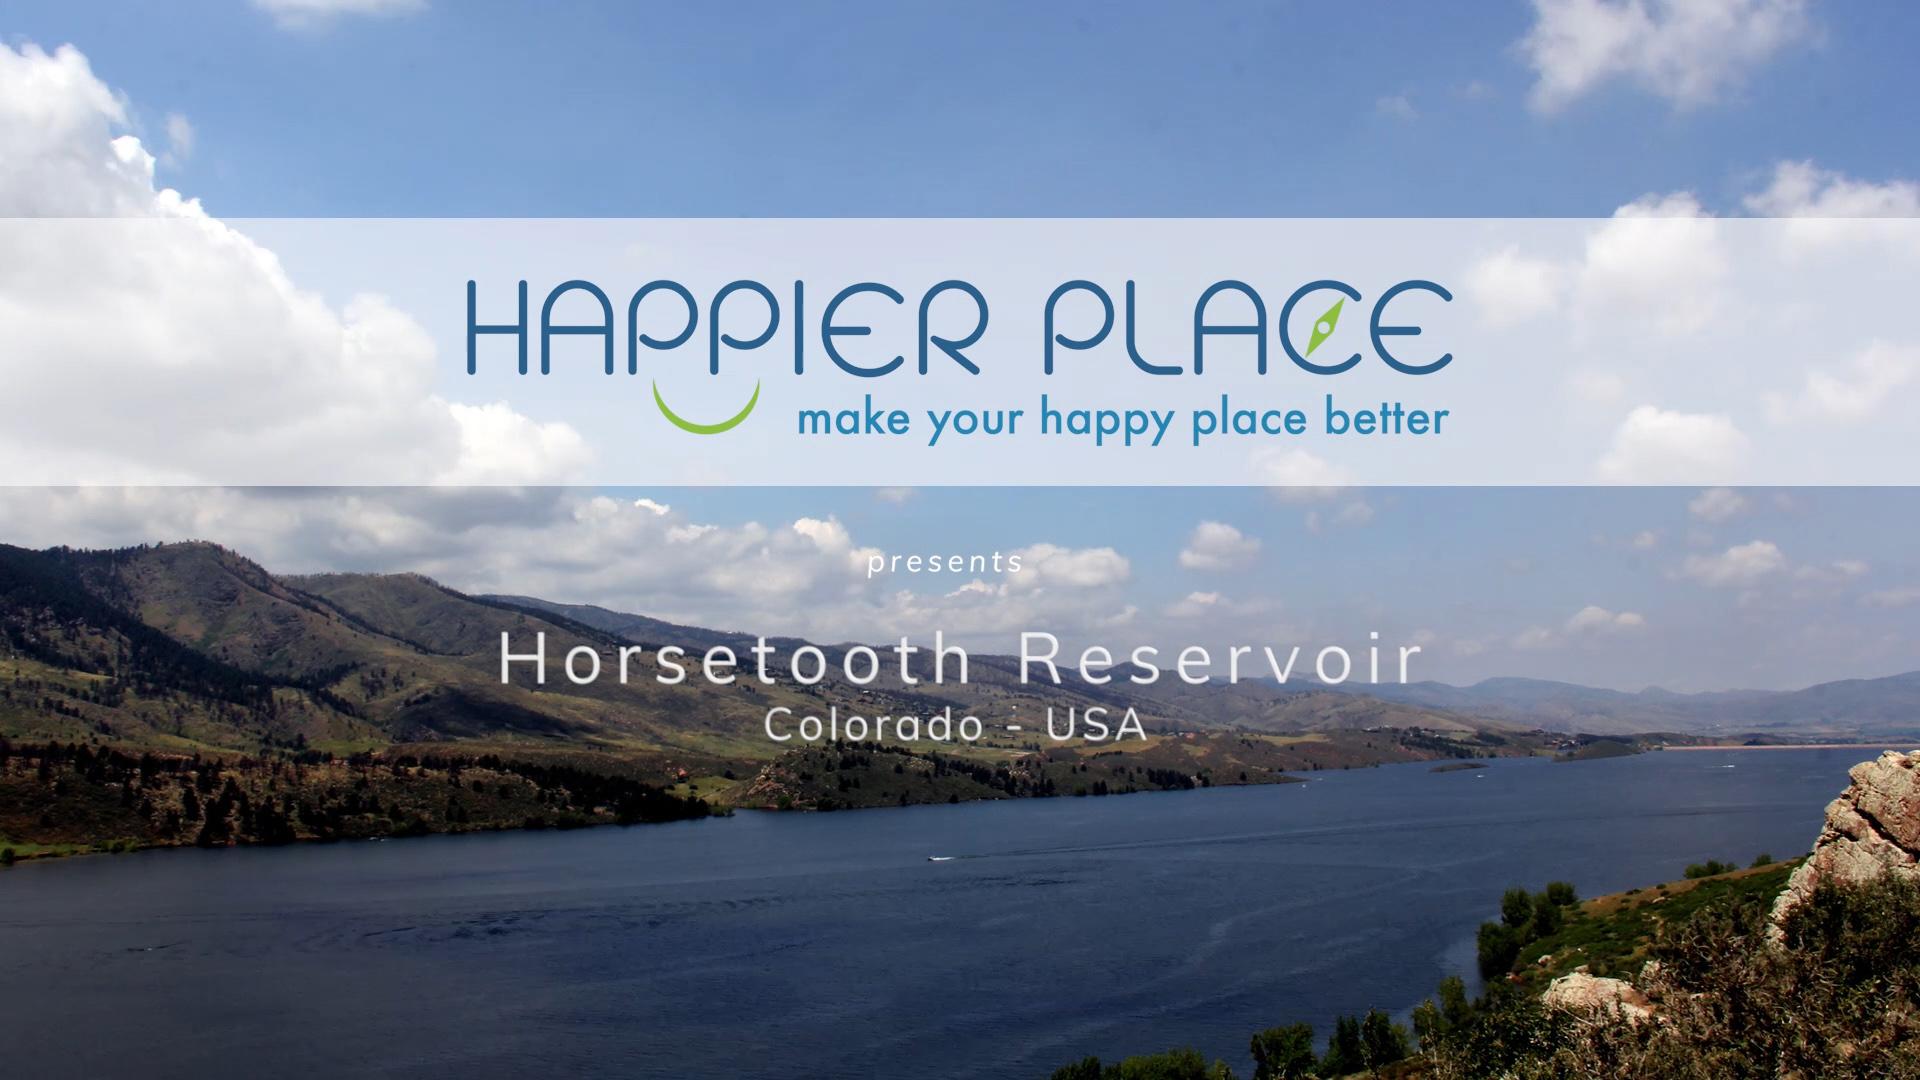 Horsetooth Reservoir - Colorado - Happier Place